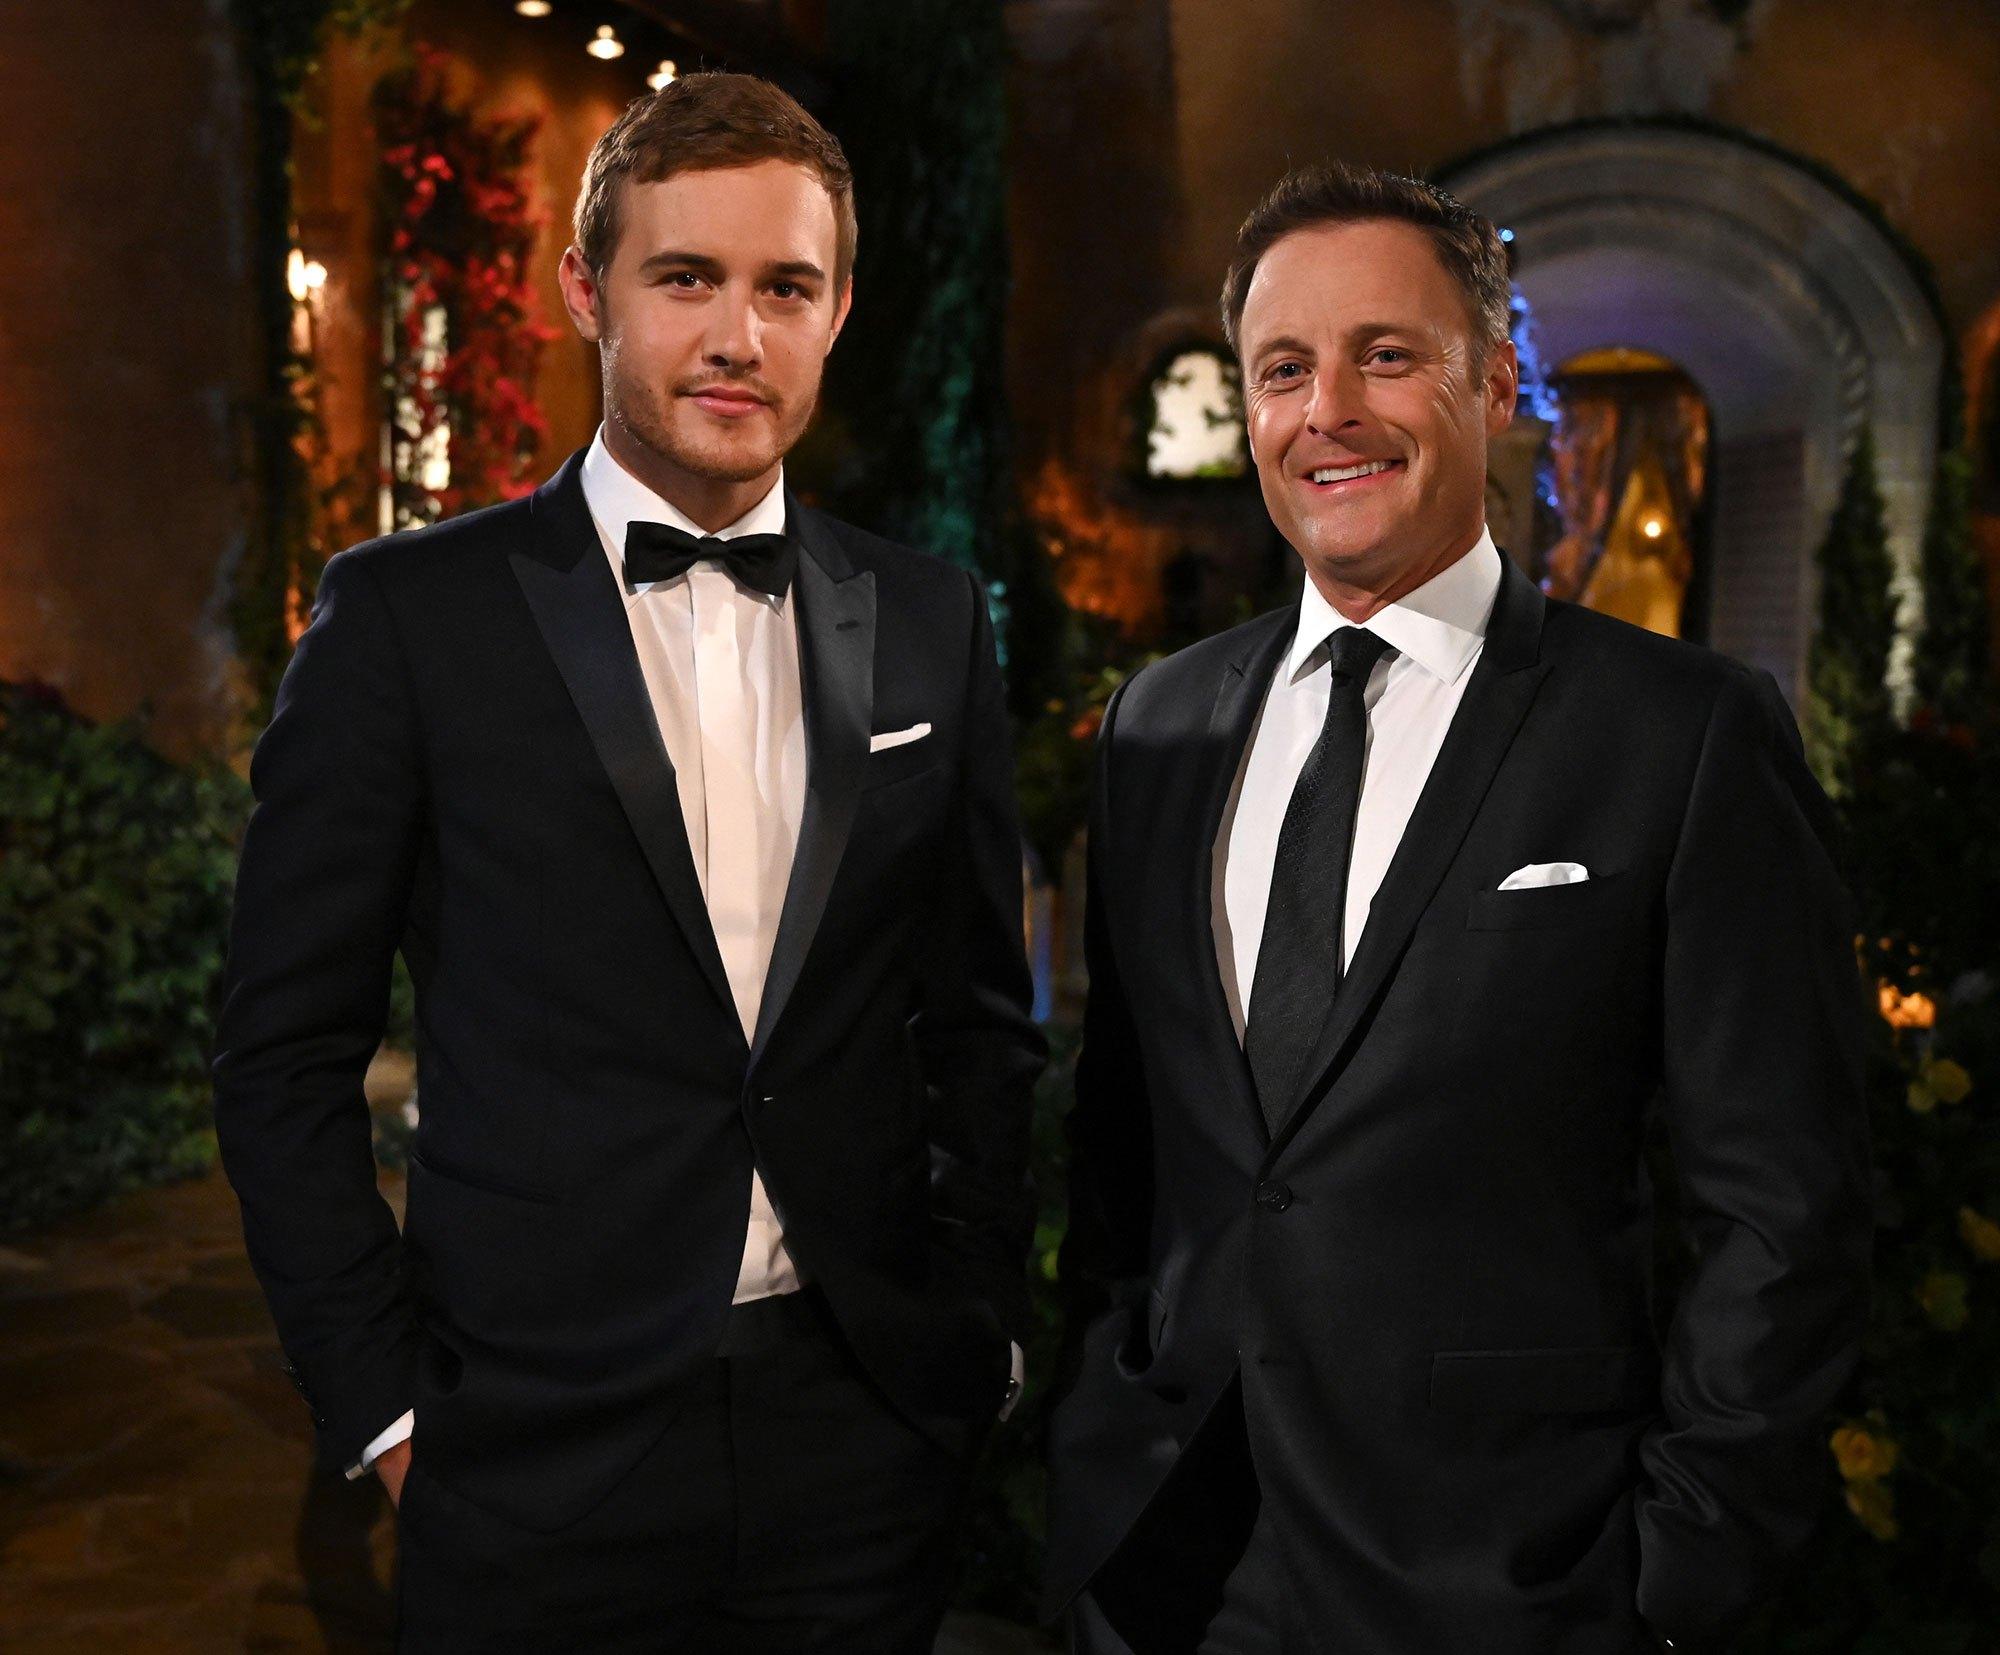 Peter Weber Bachelor and Chris Harrison Gut Wrenching The Bachelor